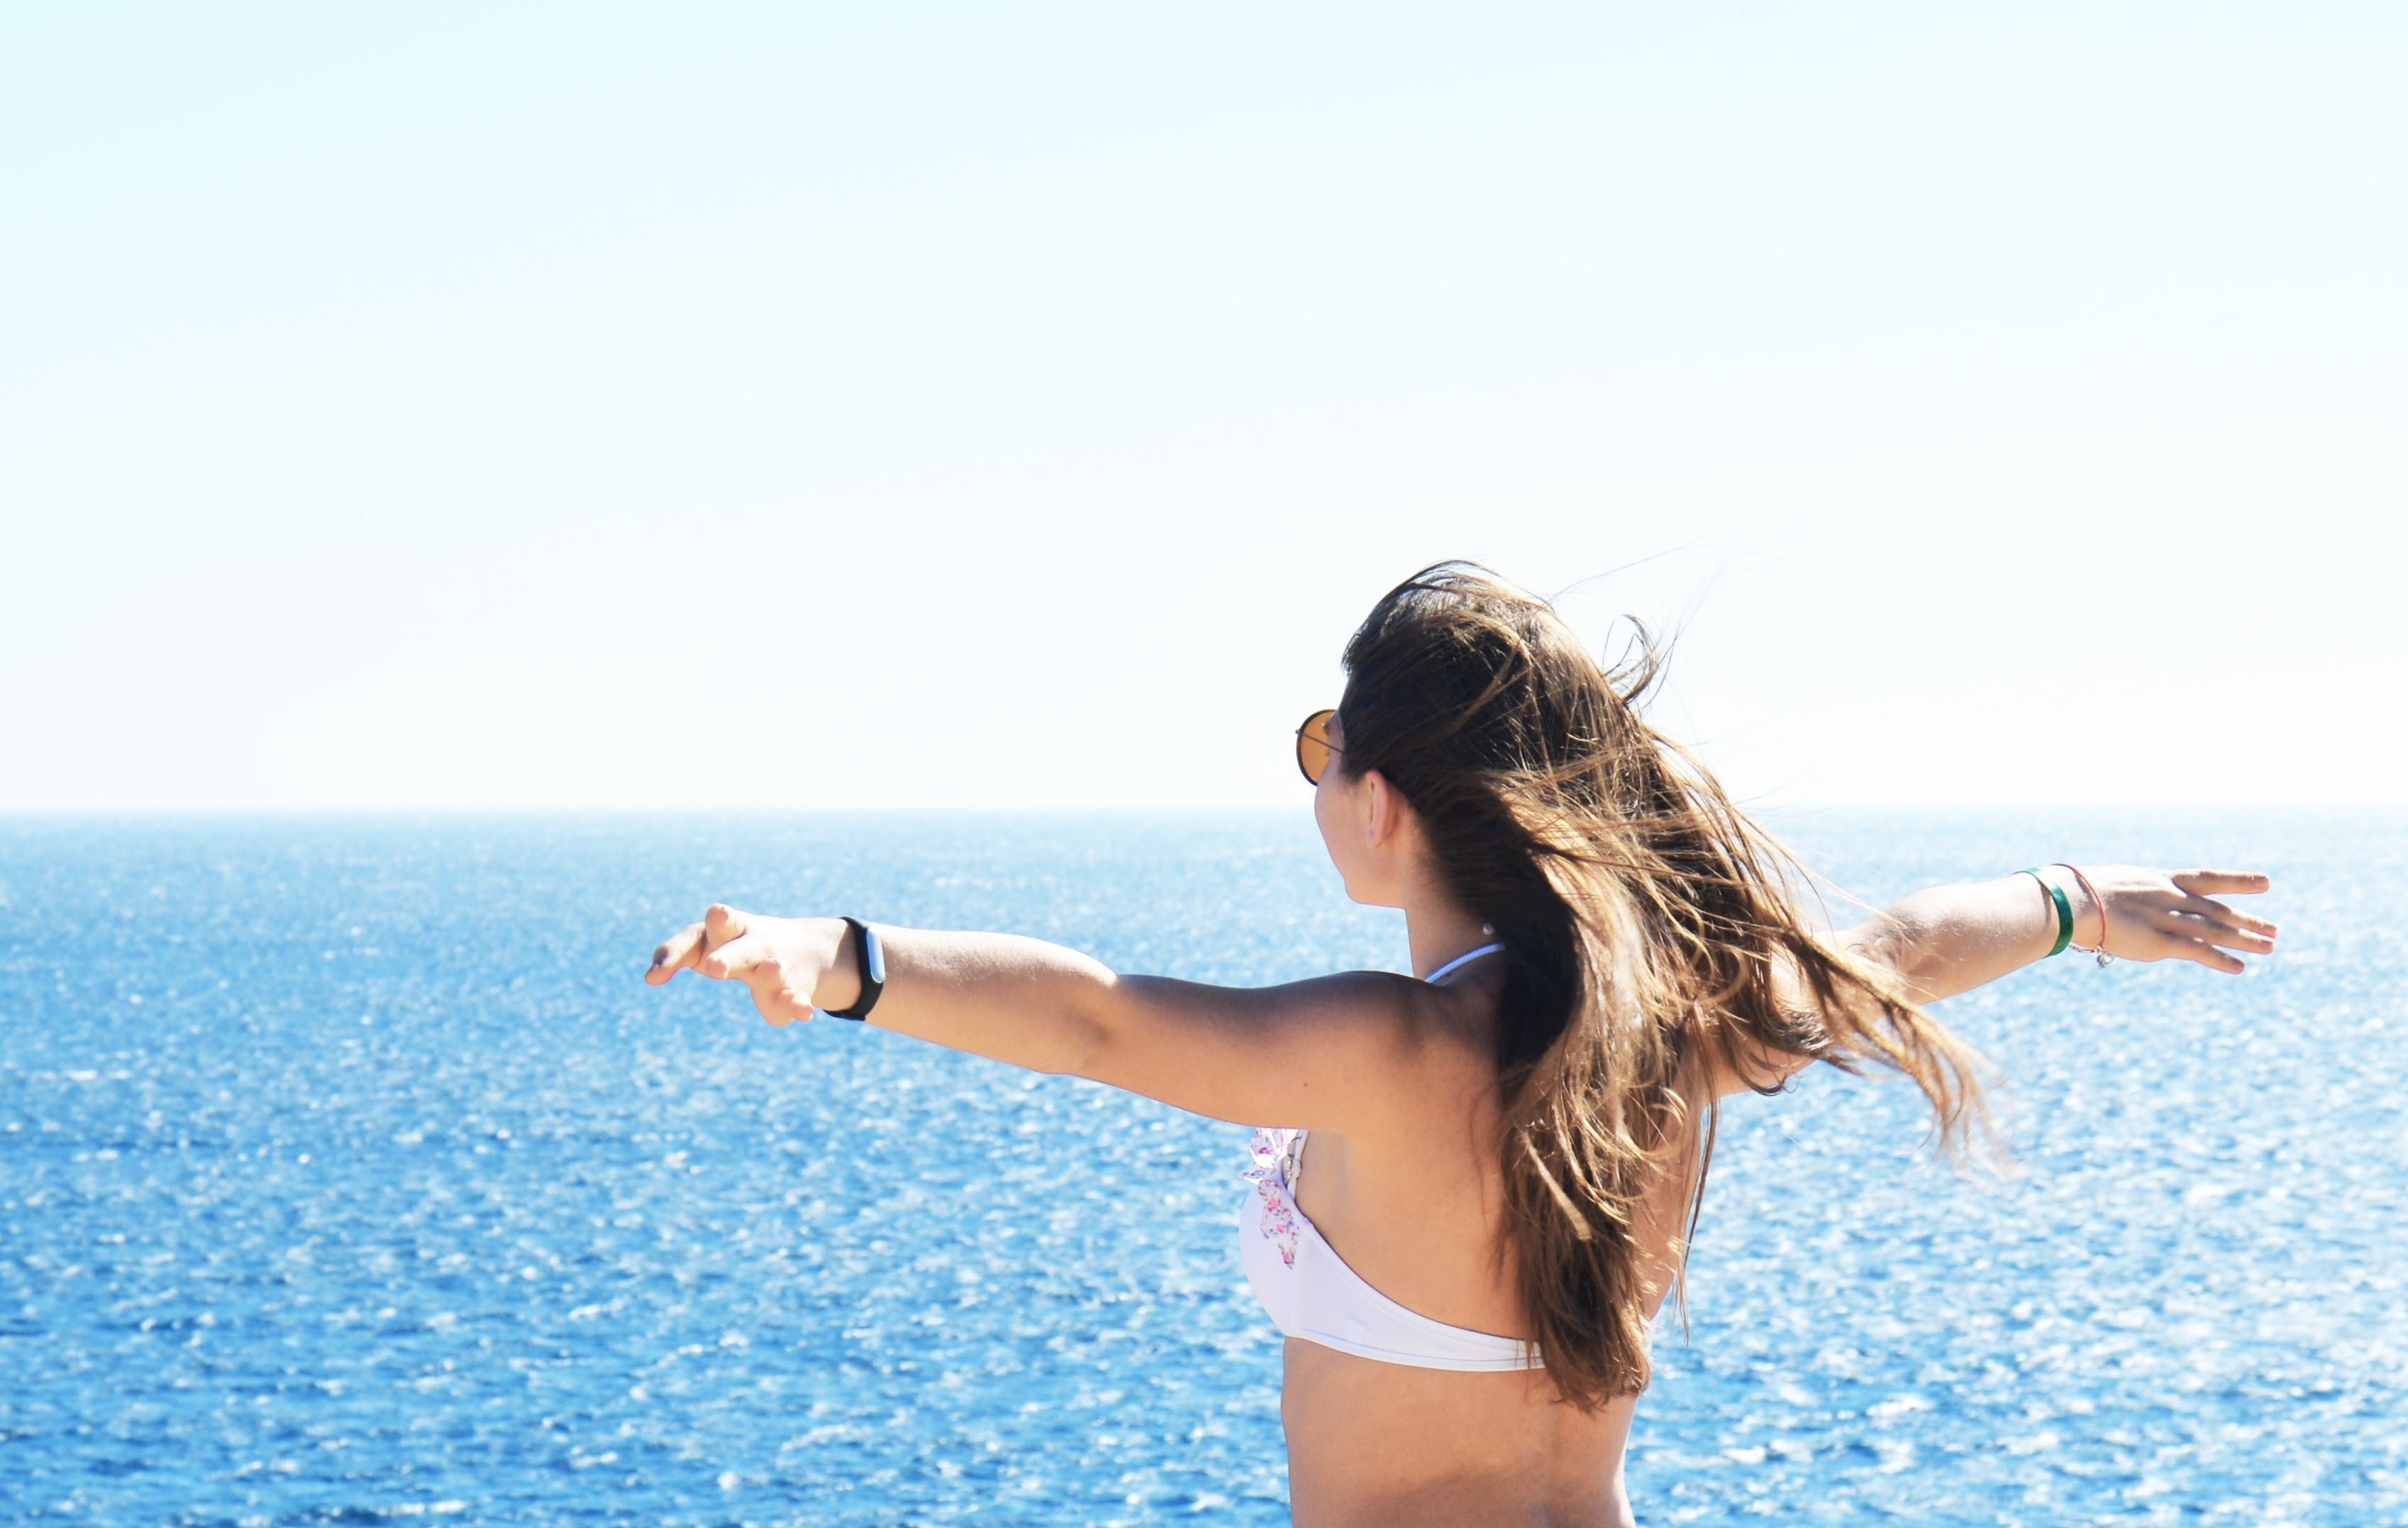 Woman Wearing White Bikini Top Standing Near Body of Water